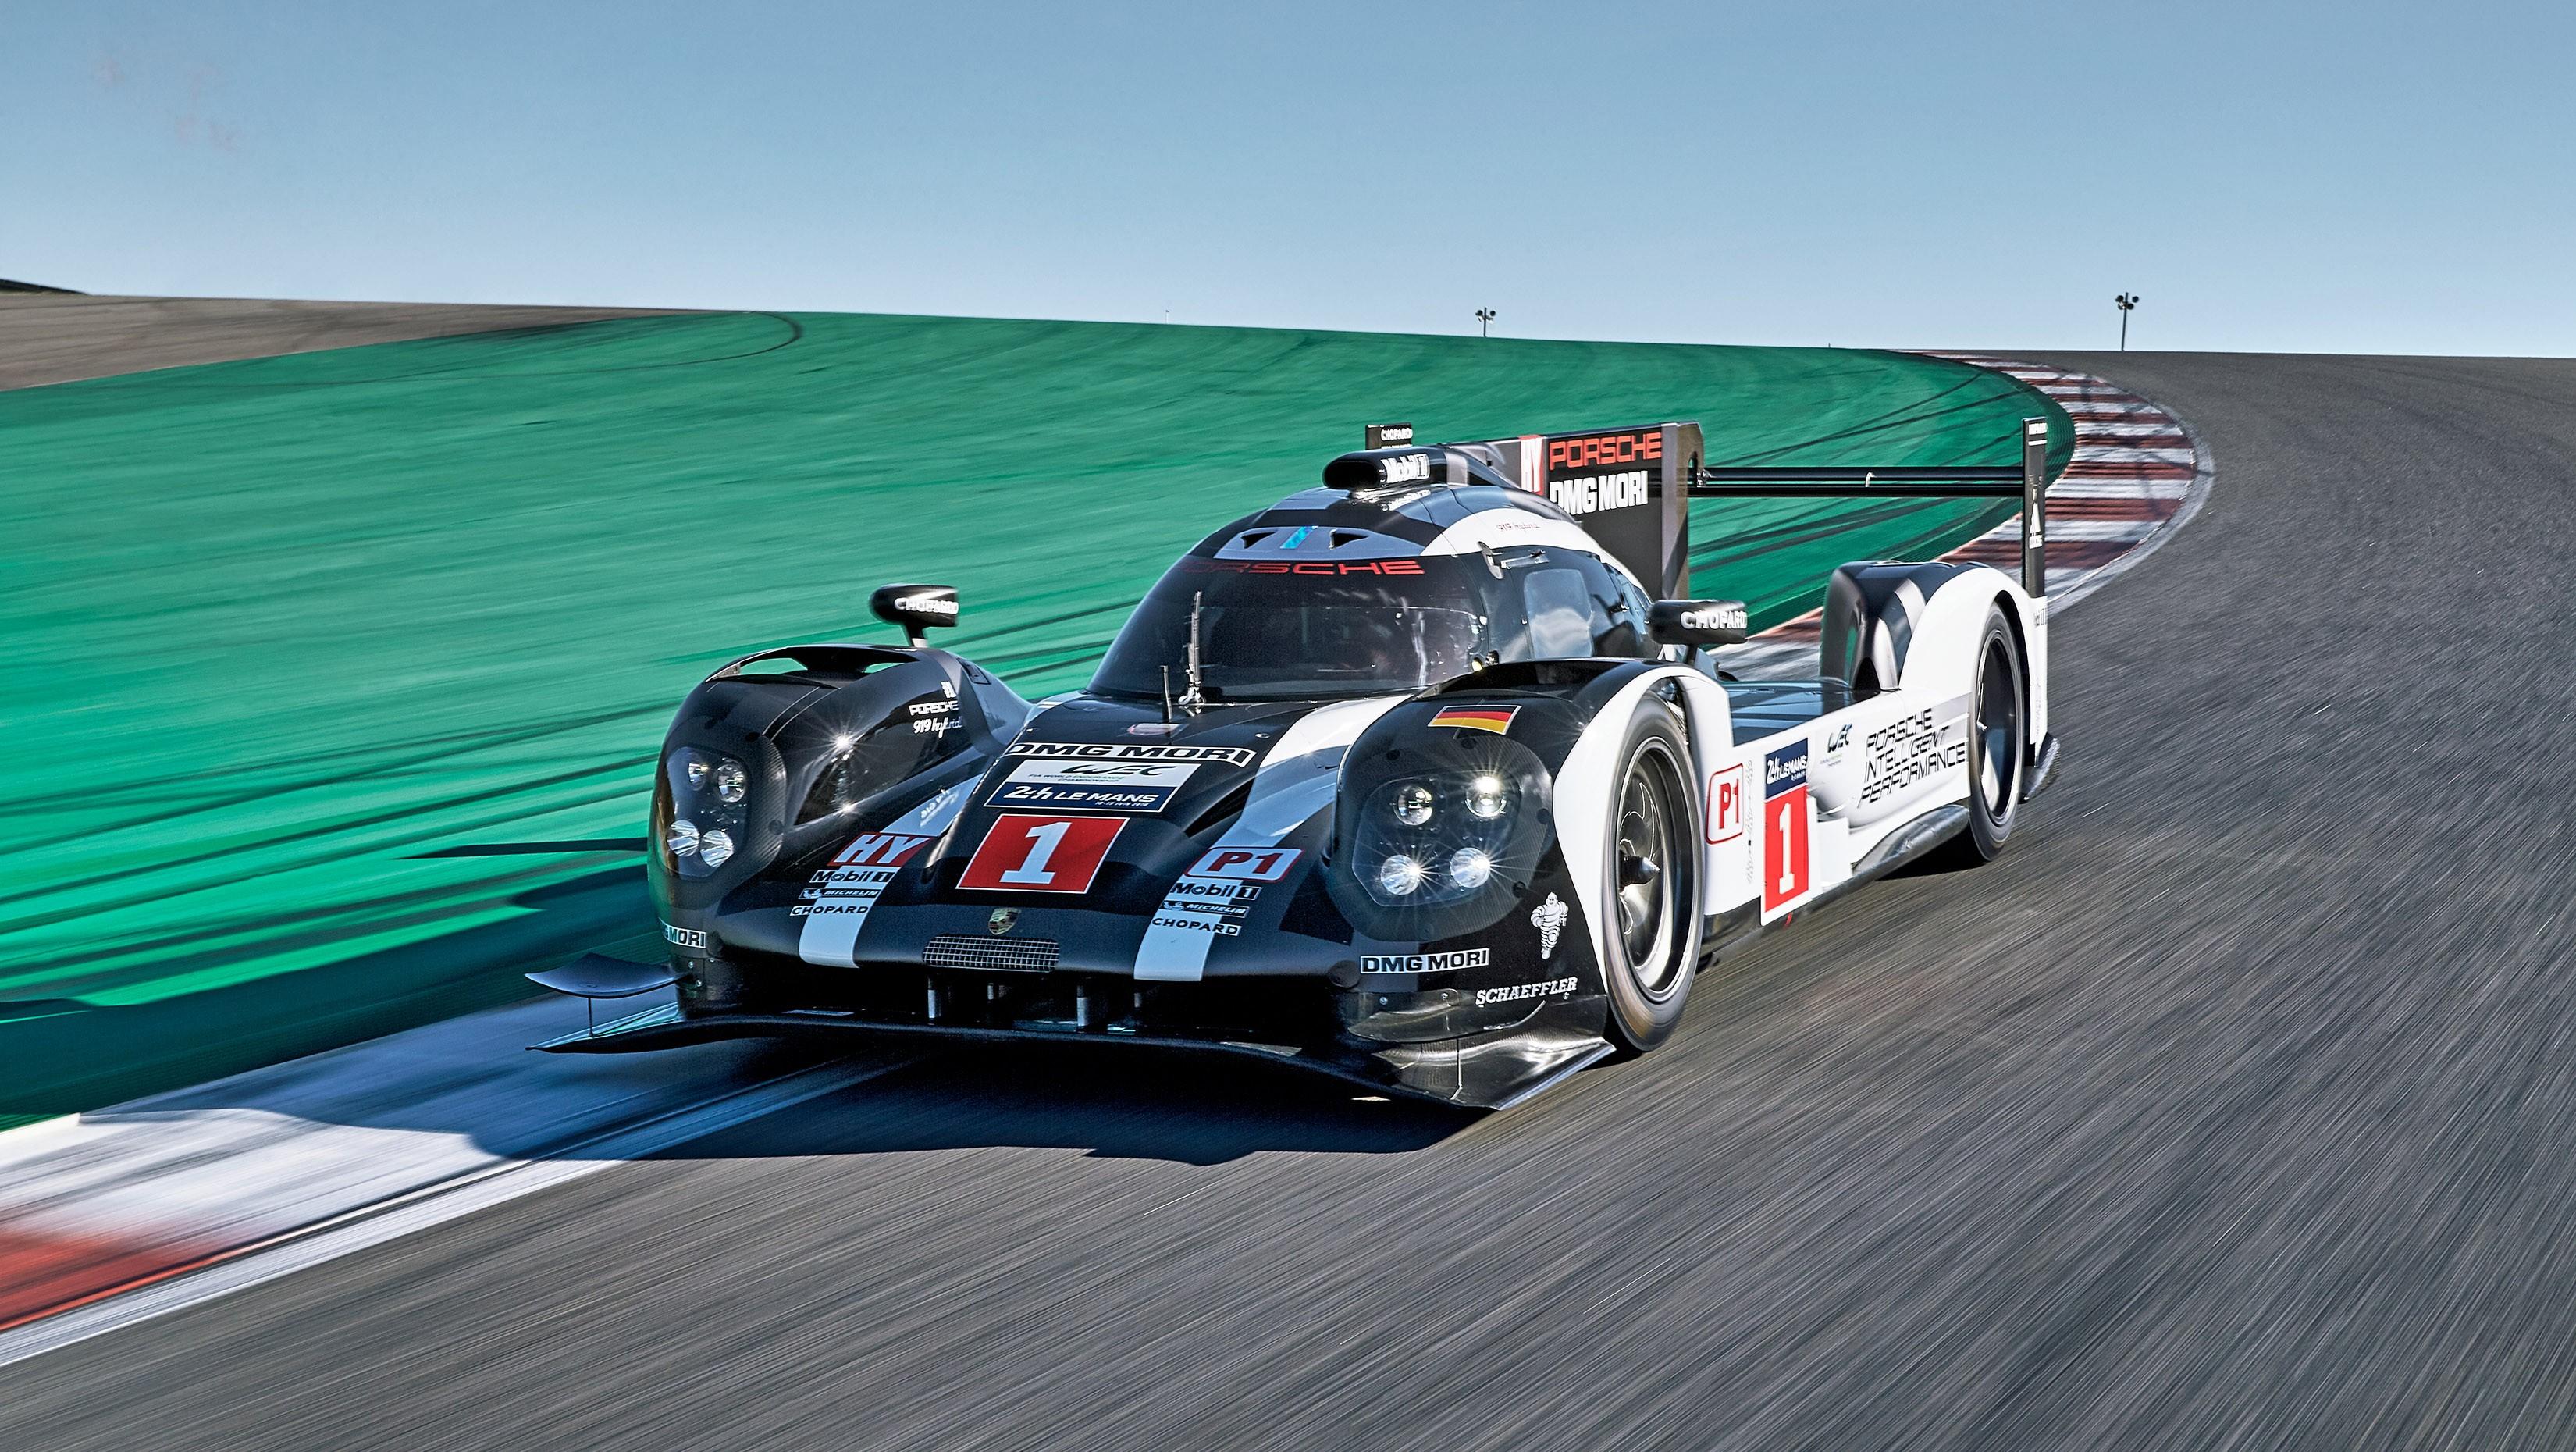 porsche 919 lmp1 hybrid race horsepower packs mans cars le prototype racer jalopnik autoevolution reveals based stef schrader speed